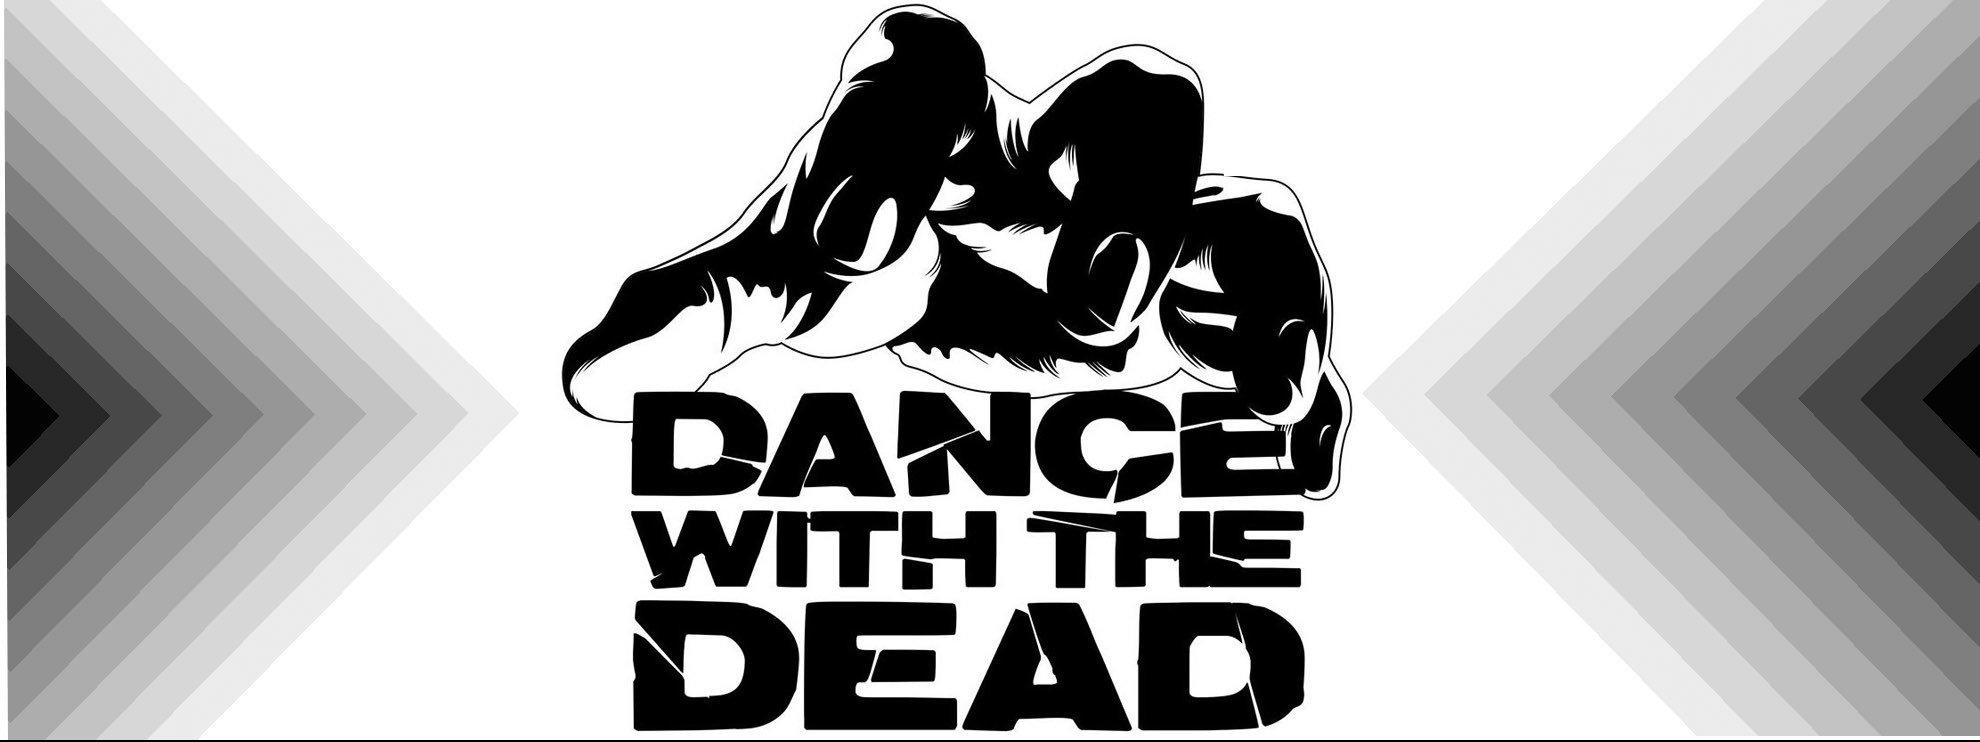 виконавець Dance With The Dead (Денс віз зе дед)